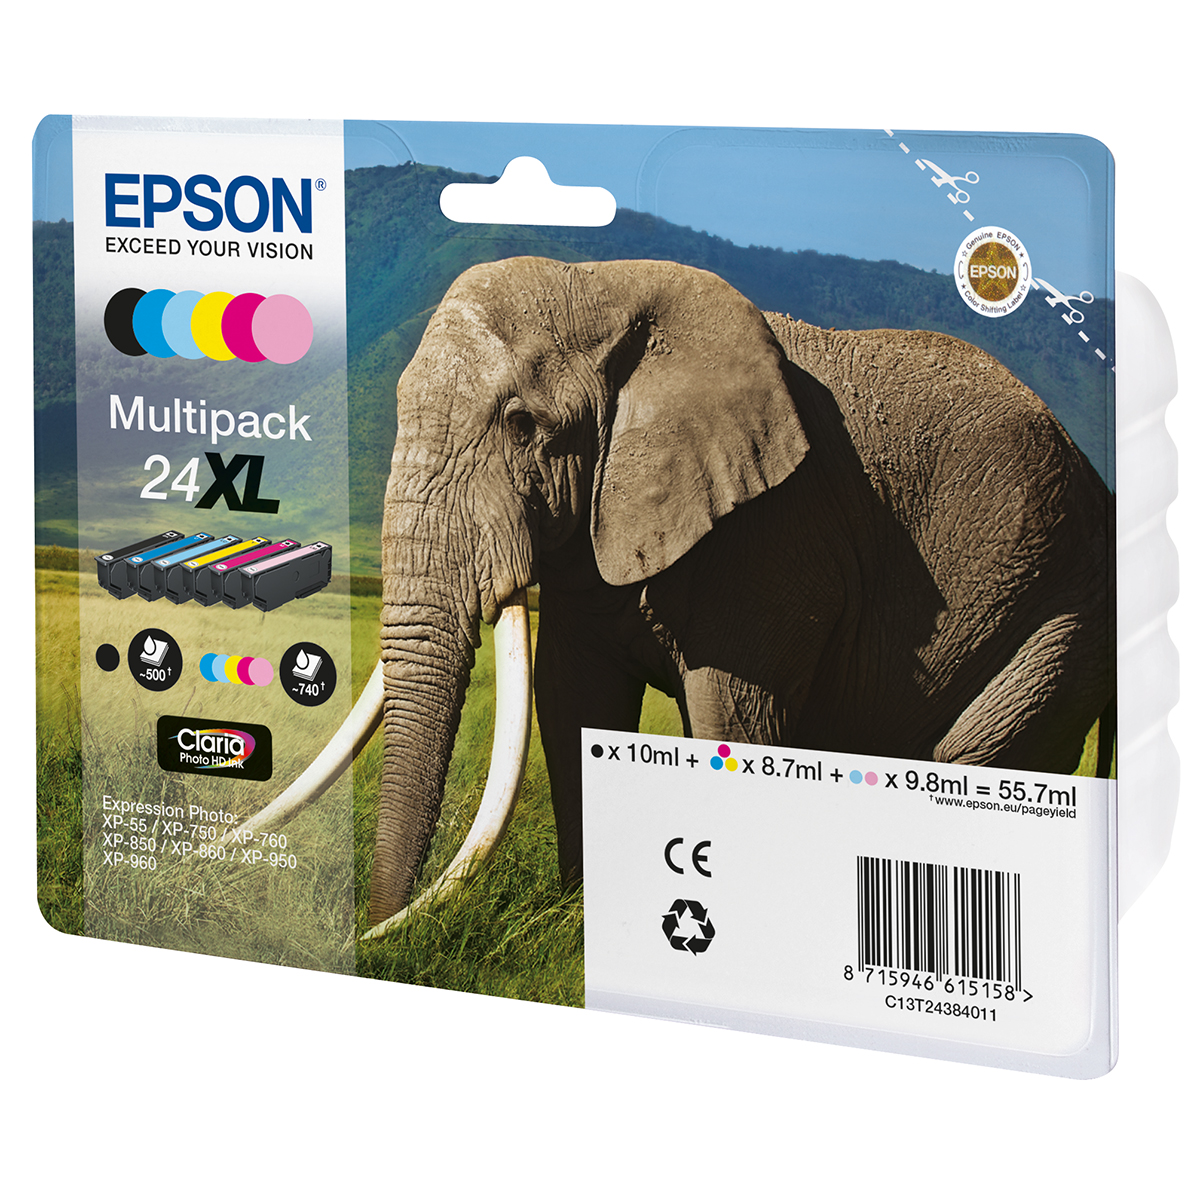 Epson 24XL Multipack 6 Ink Photo HD Cartridges